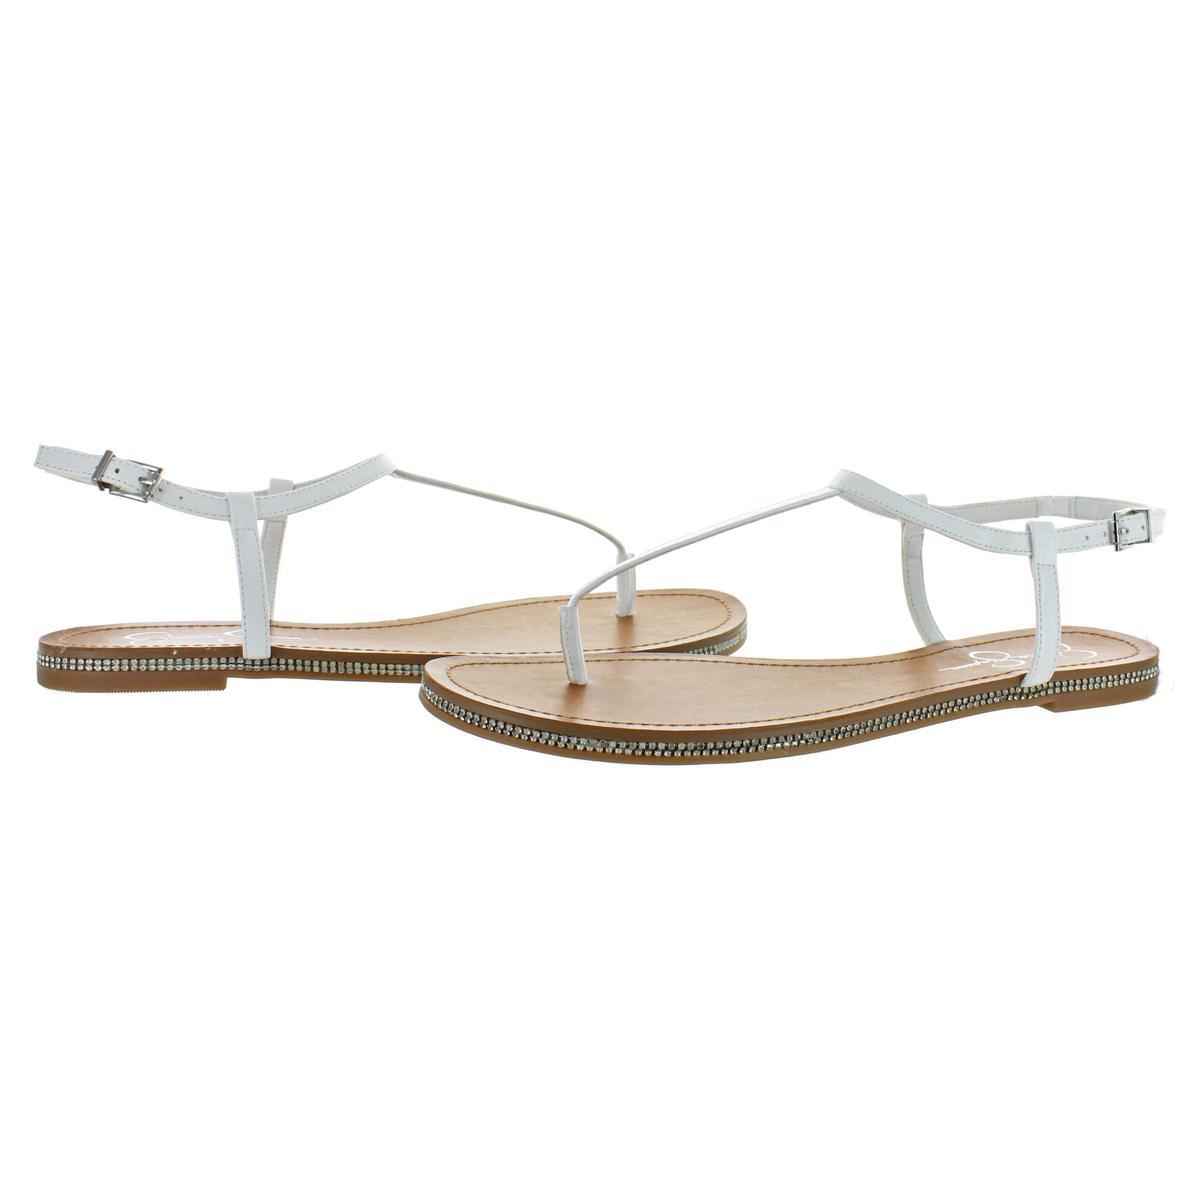 Jessica-Simpson-Femme-Brimah-Casual-String-Spartiates-Chaussures-BHFO-1194 miniature 4